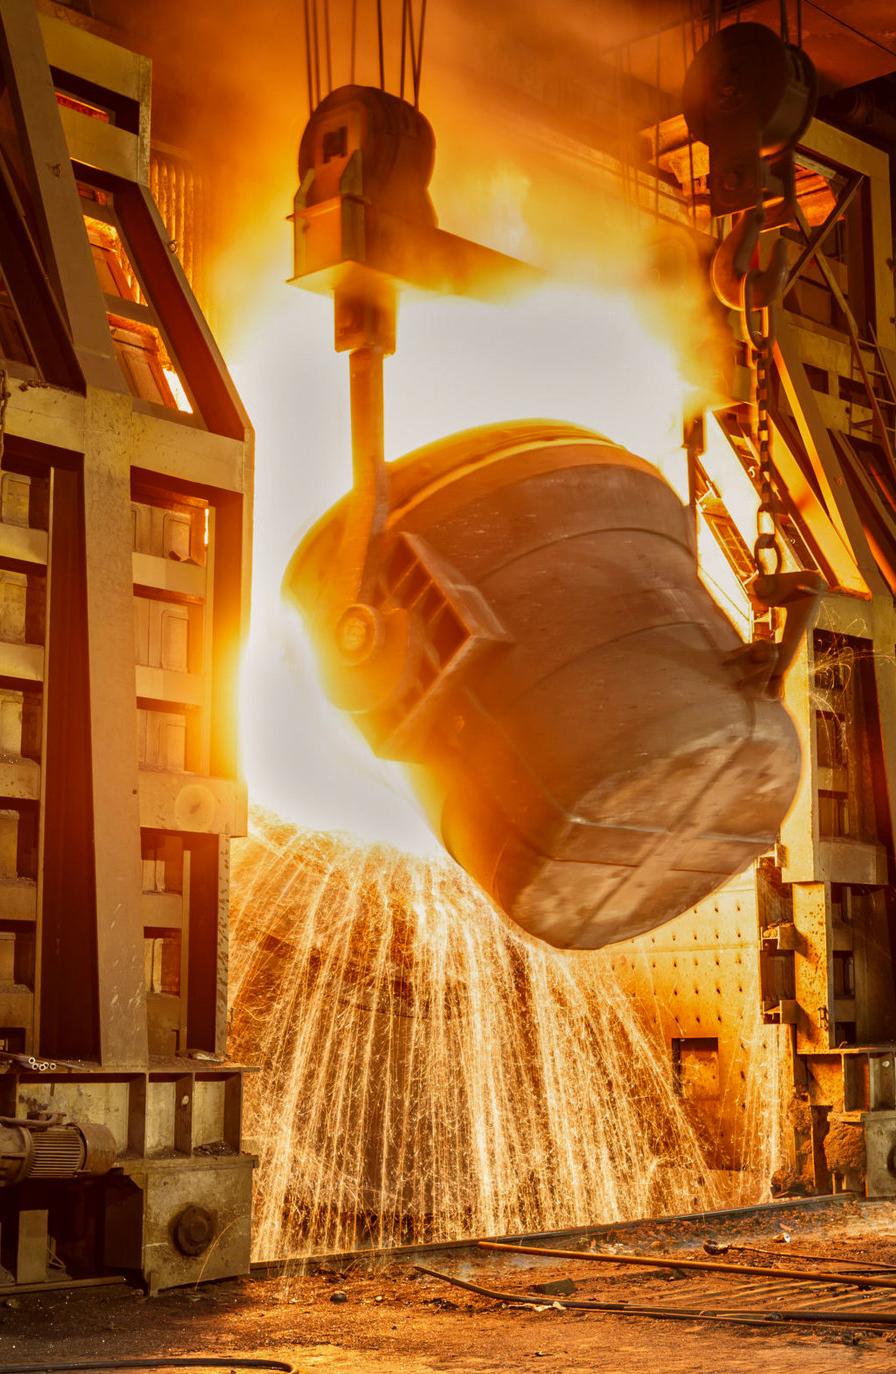 5. khadamat ma - صنعتی و بازرگانی